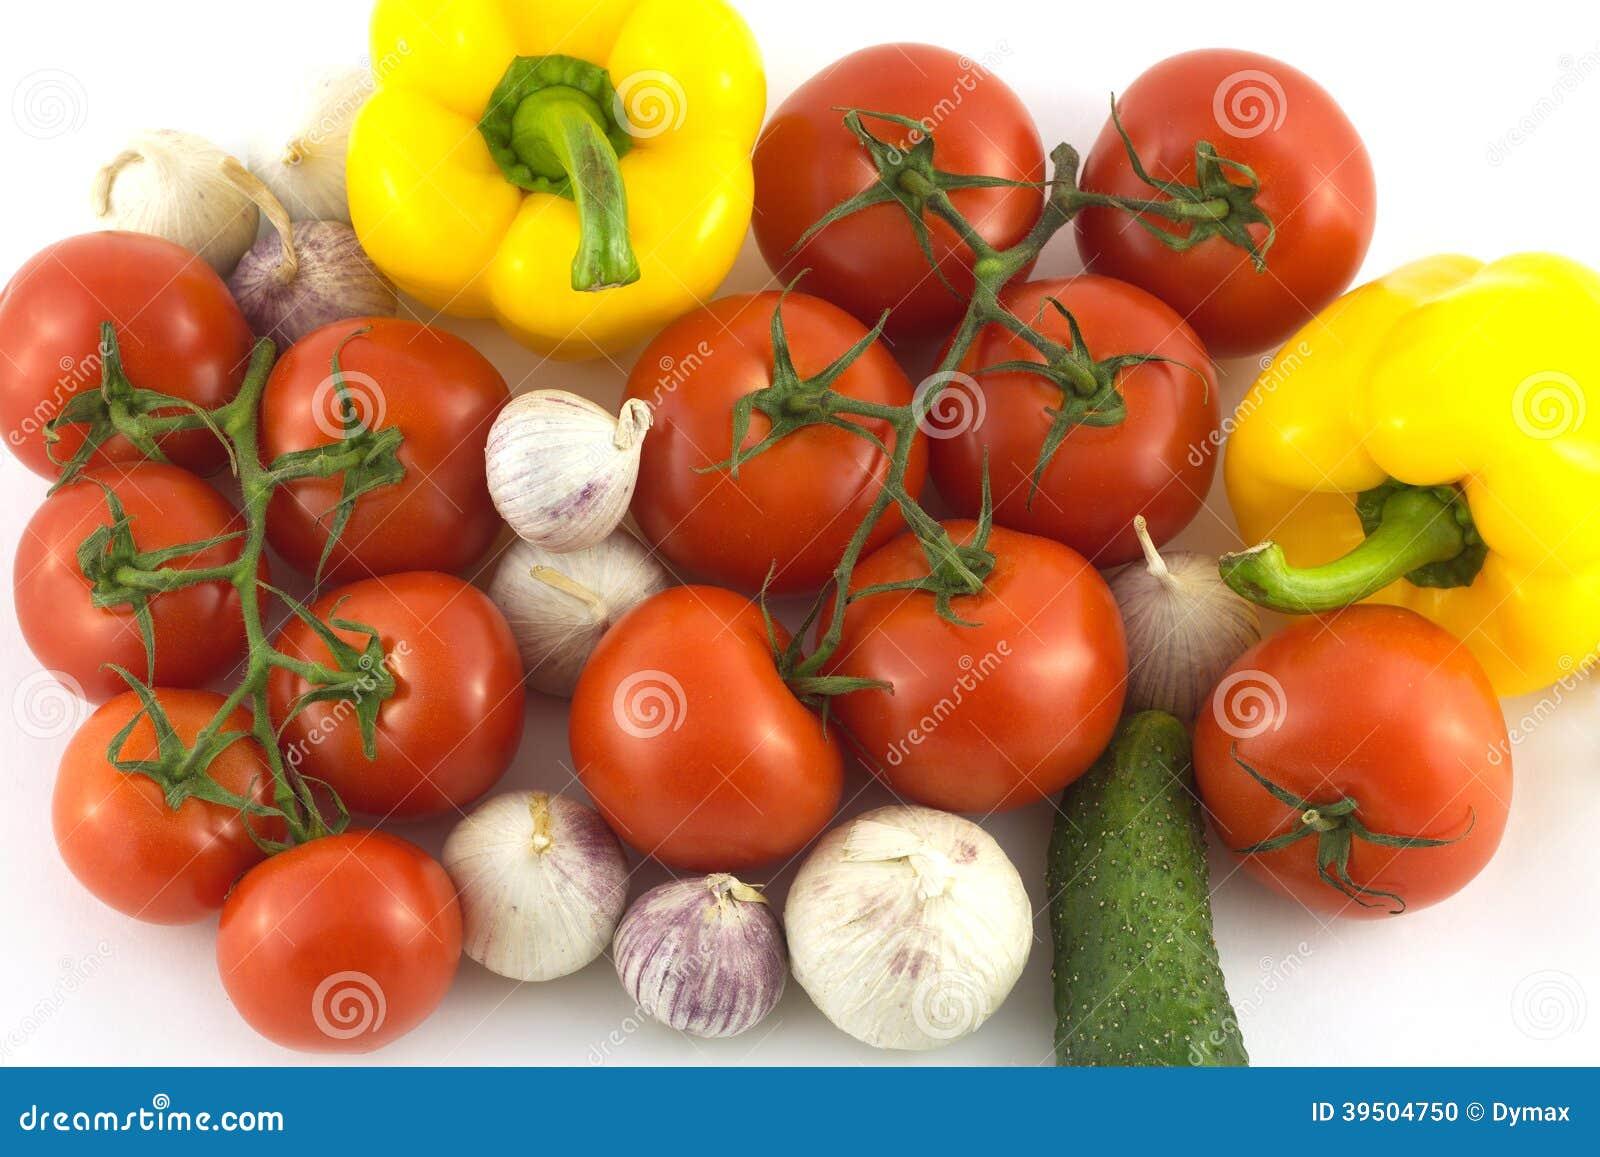 Assorted ripe vegetables closeup